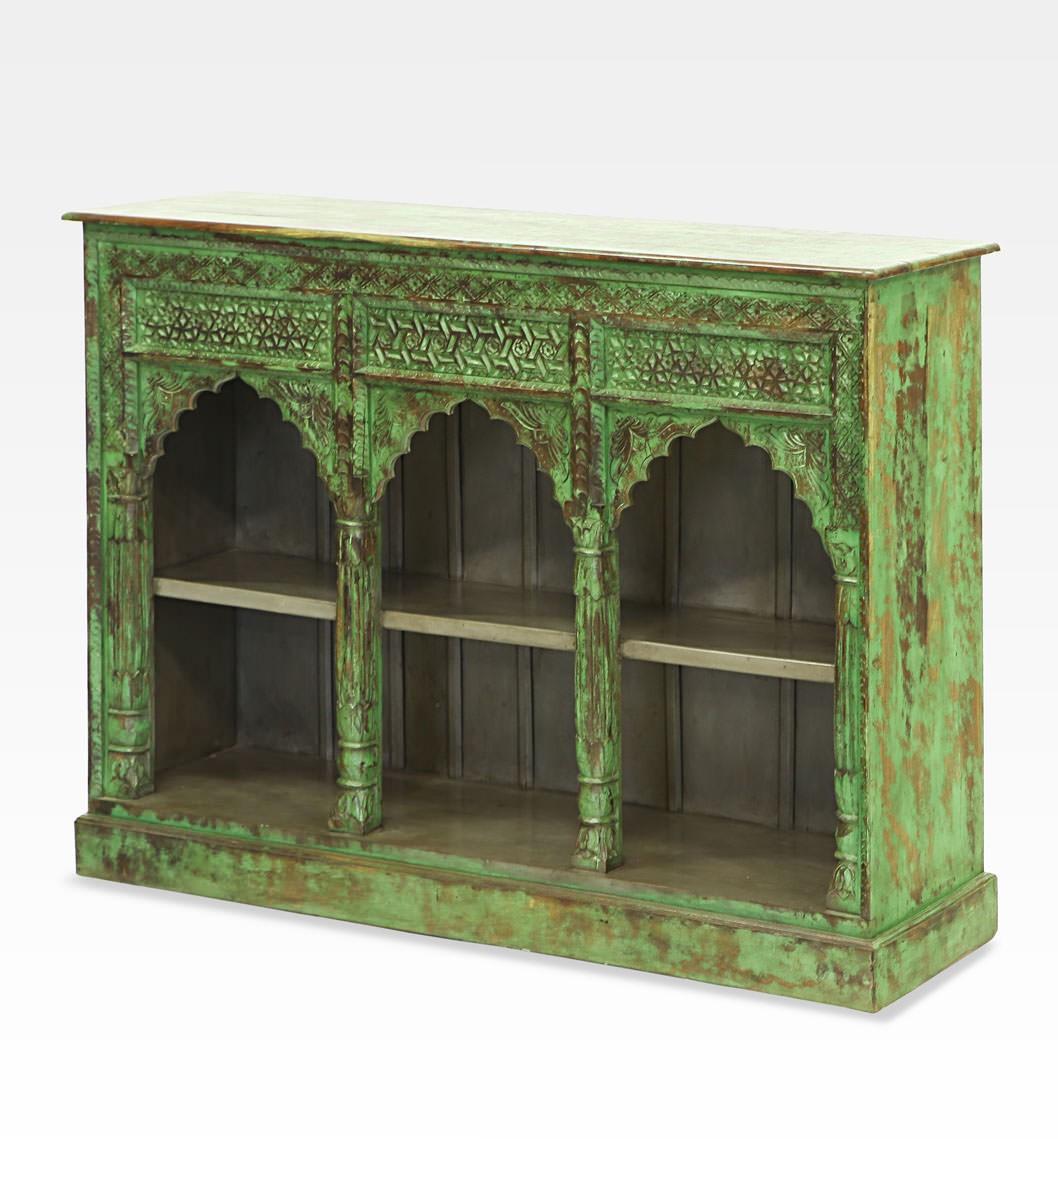 Libreria indiana verde decapata legno di mango 0022 0022 - Libreria verde ...